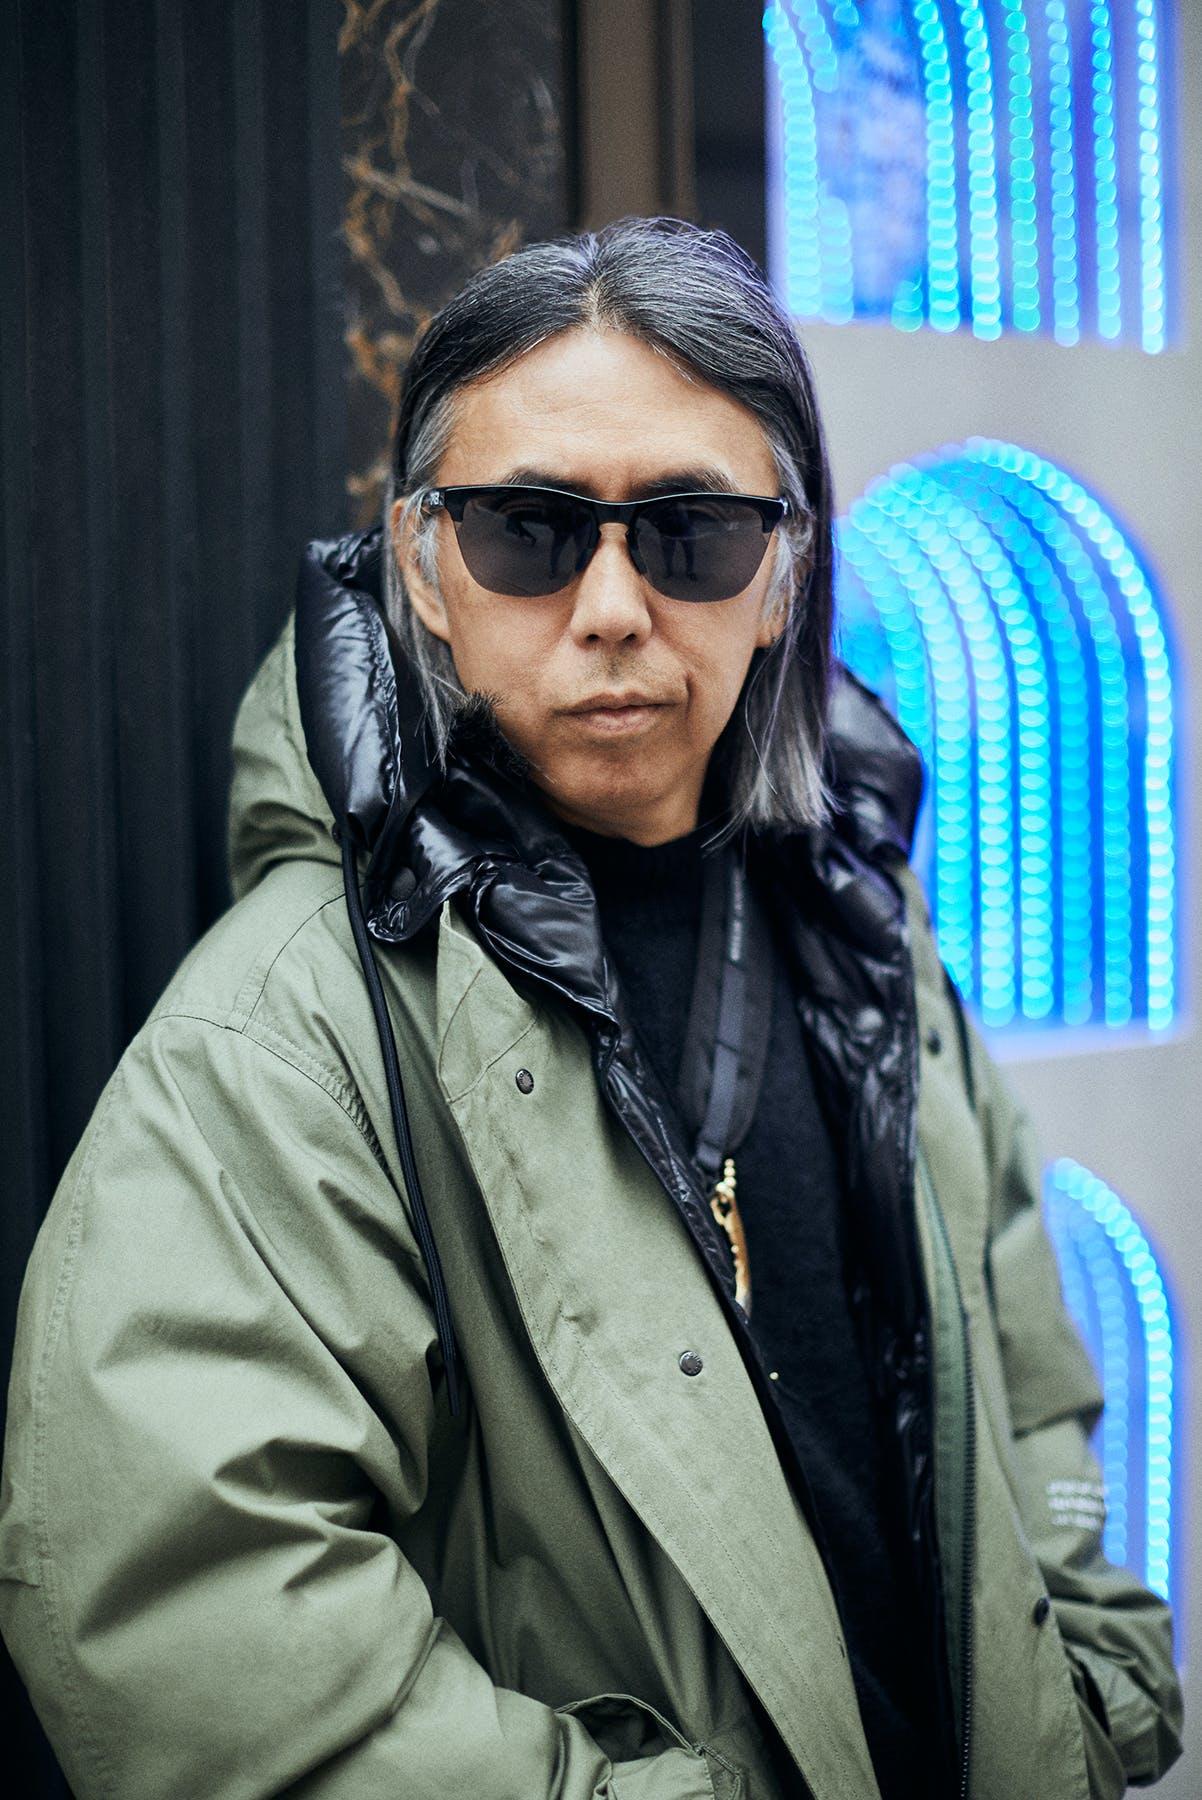 Hiroshi Fujiwara photographed in London